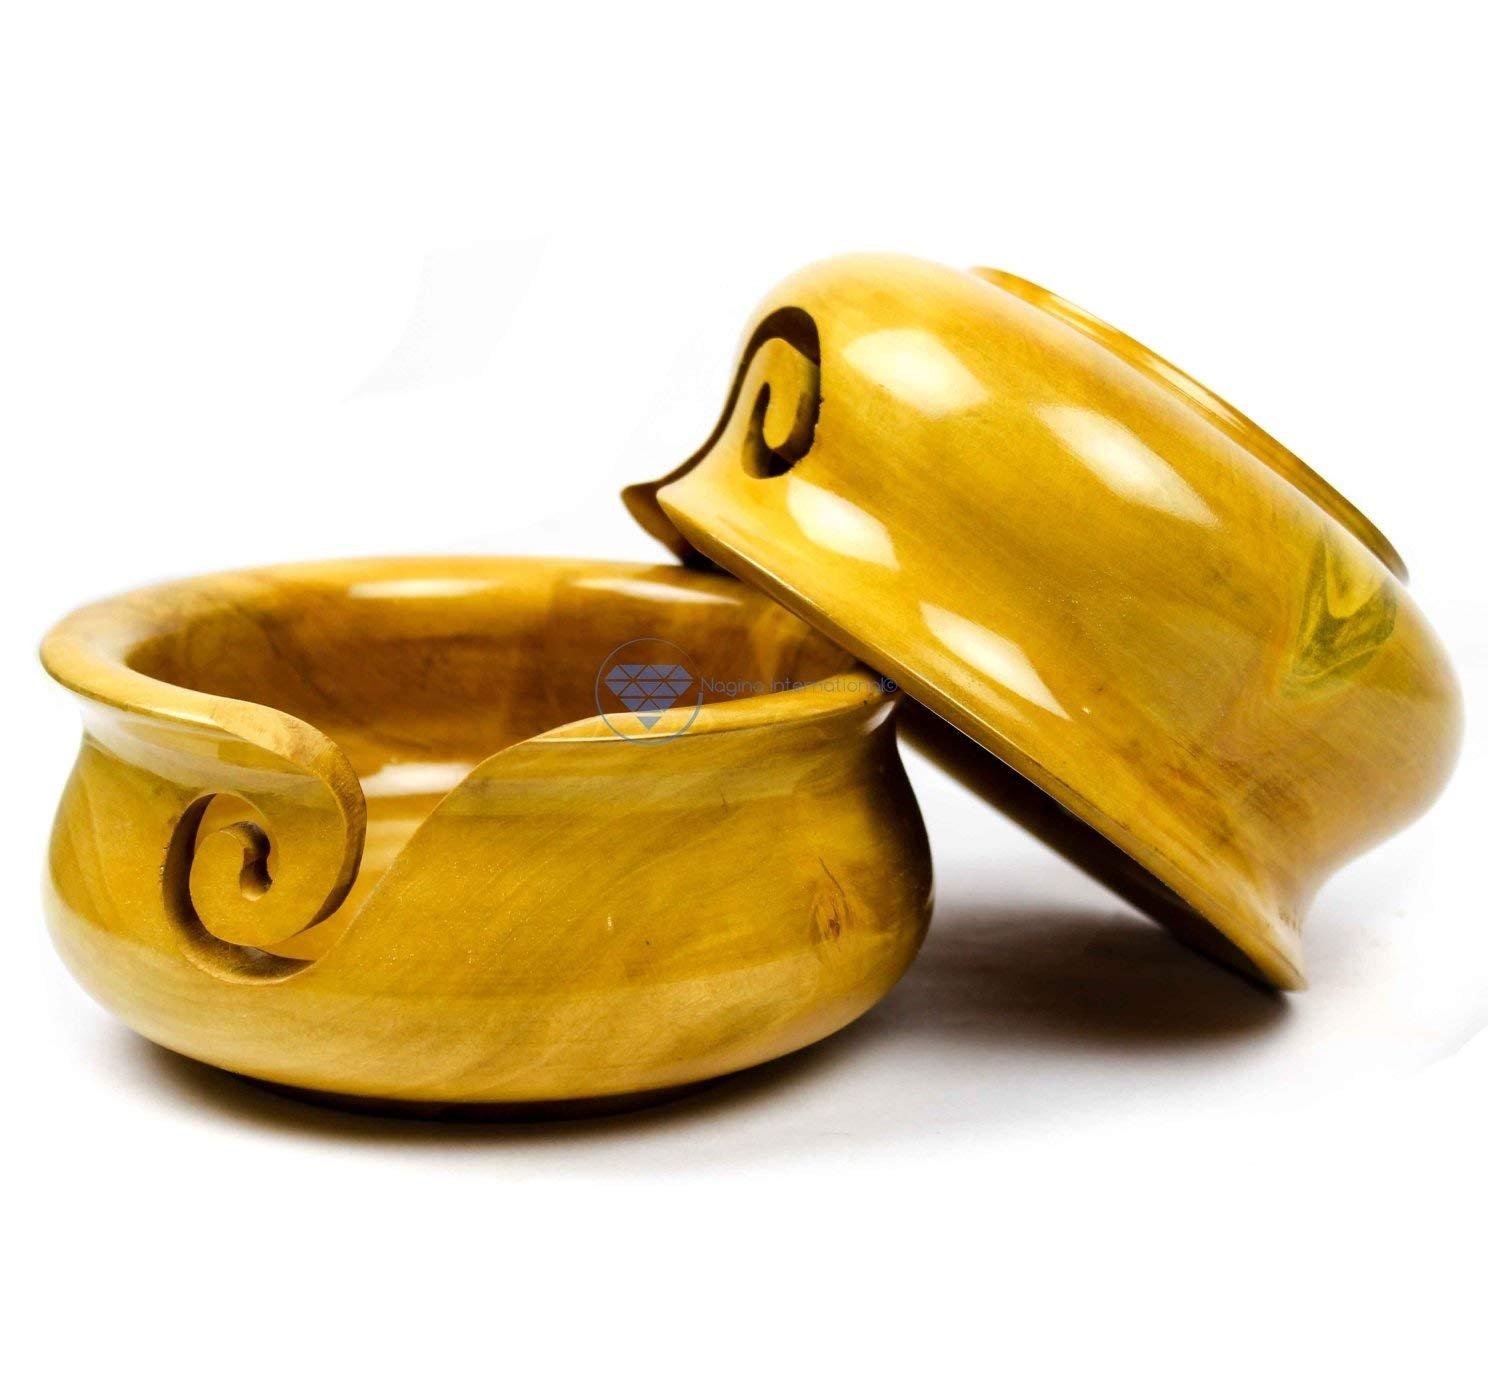 Large Wooden Mango Pot Styled Yarn Ball Storage Bowl Innovative Dispensing Curl | Nagina International yarnbowl3